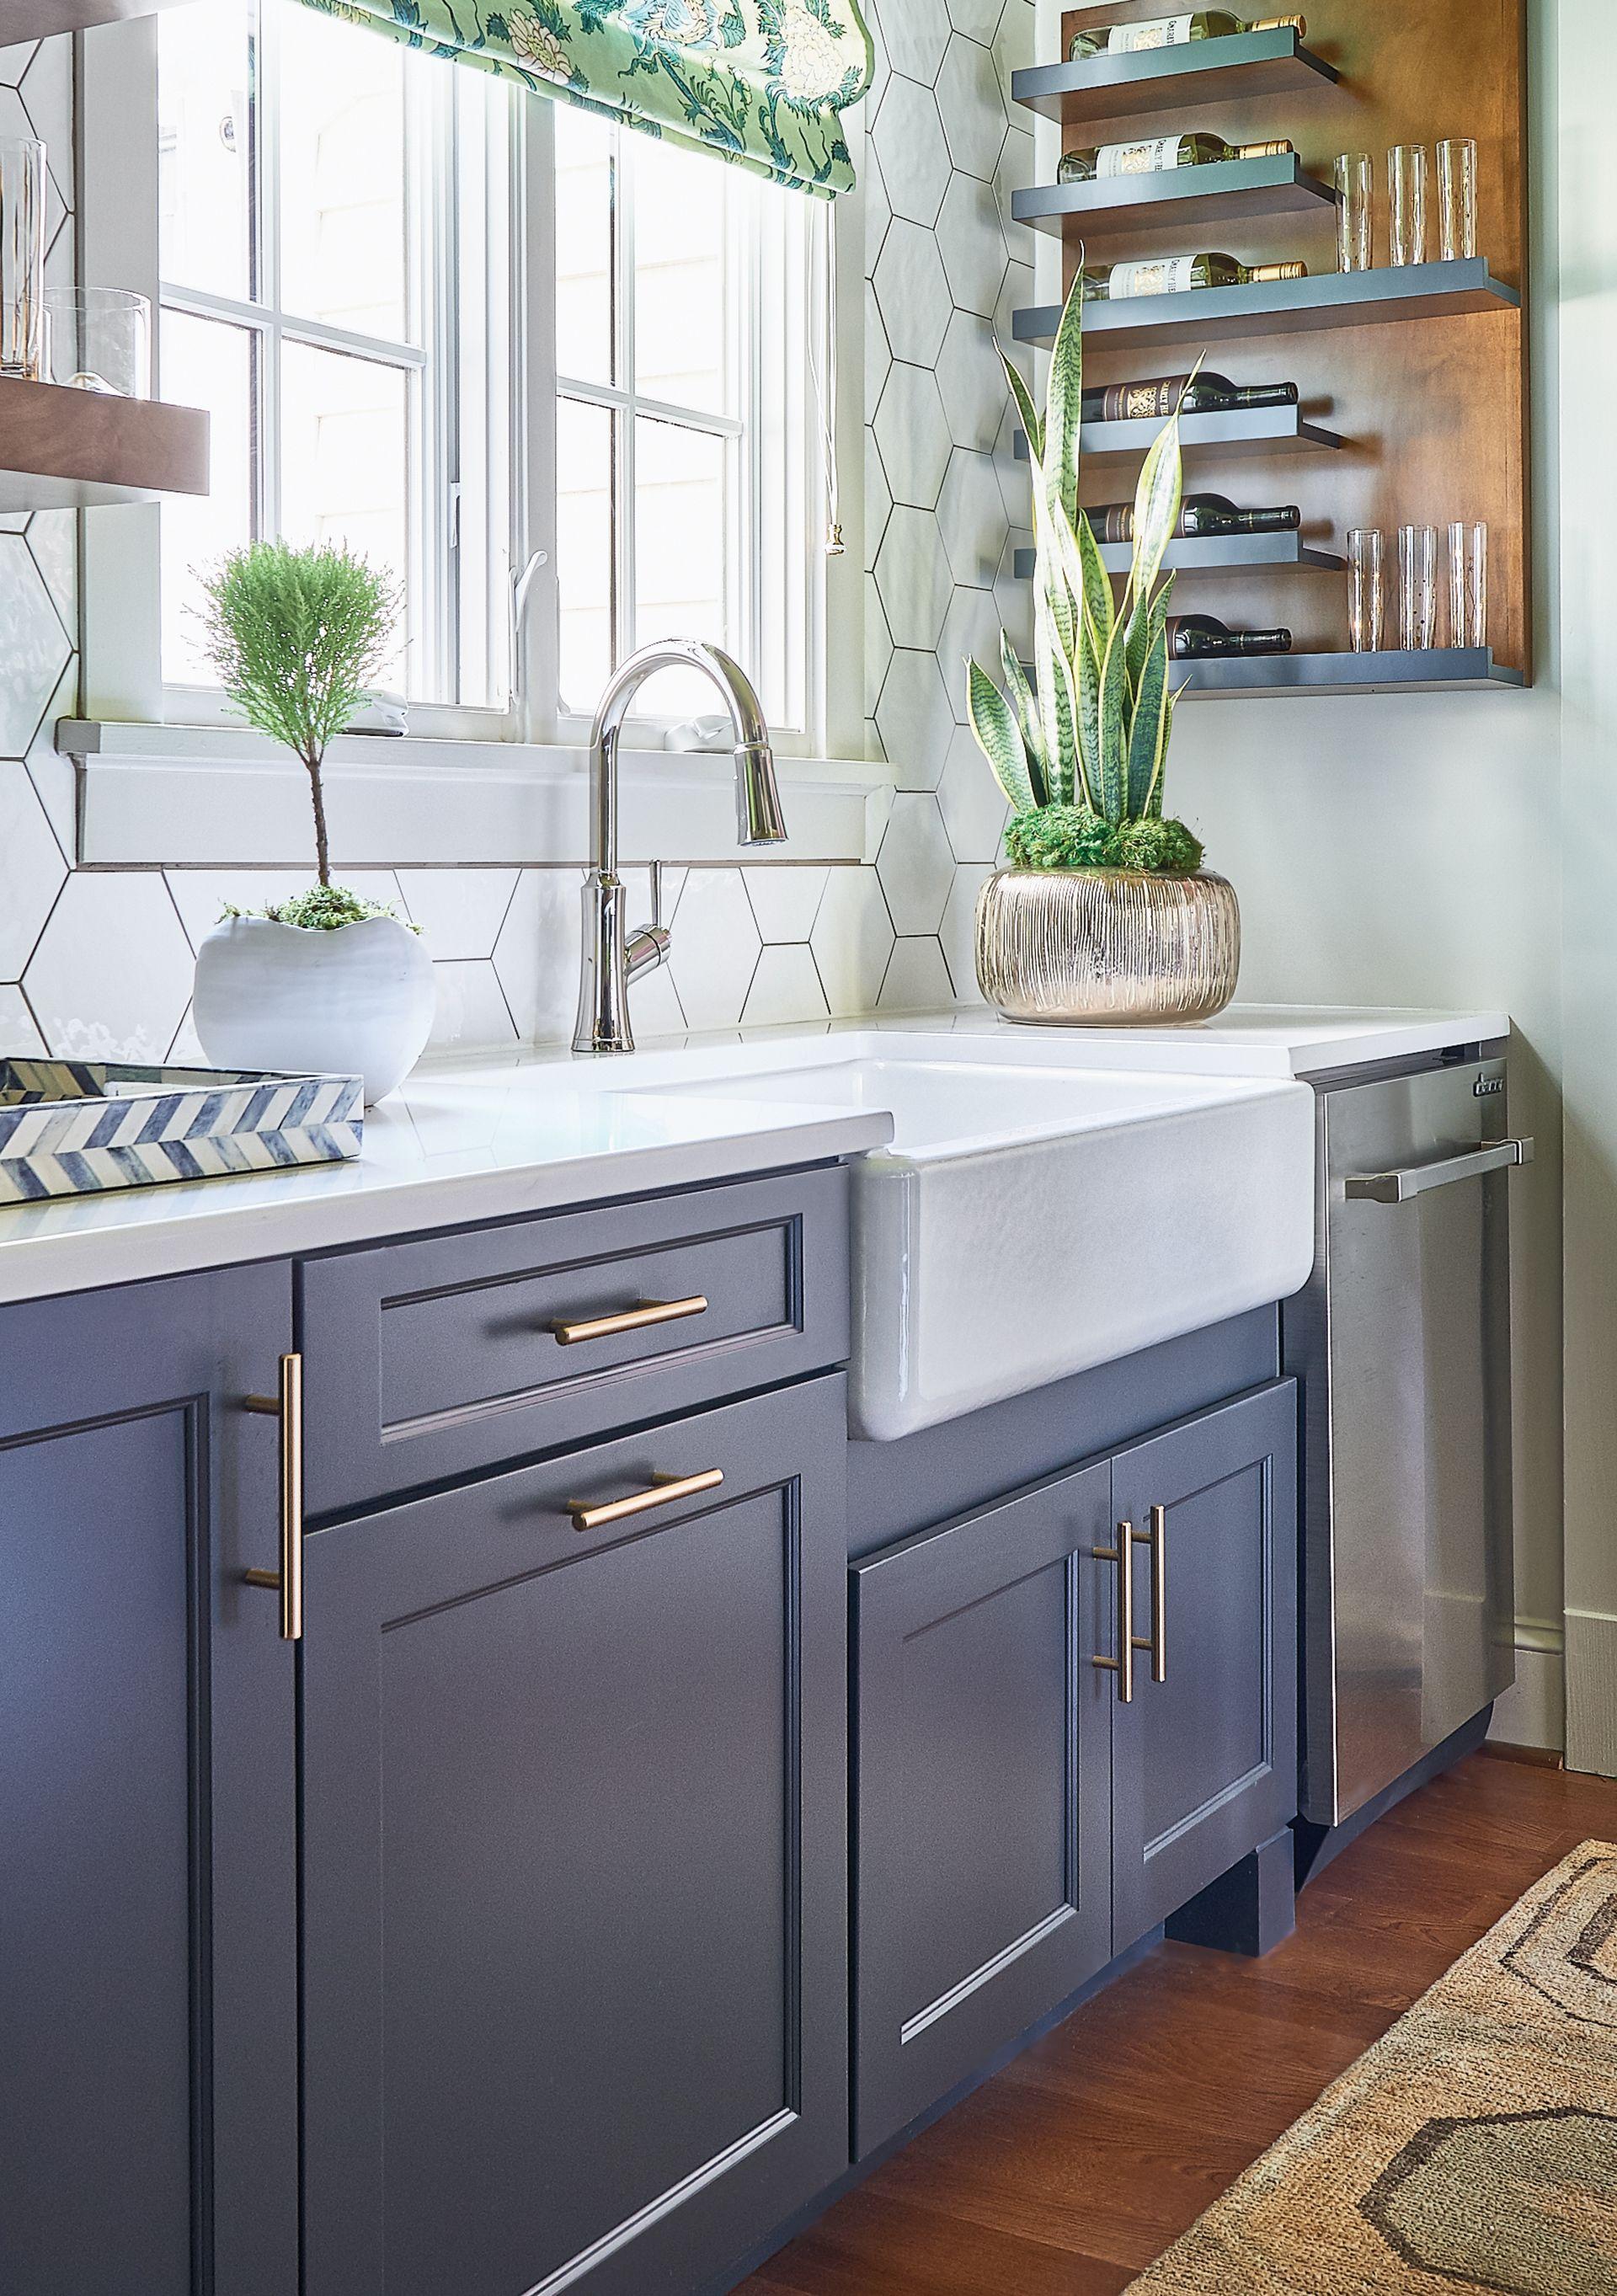 Hansgrohe Joleena Kitchen Faucet Kitchen Room Design Home Decor Kitchen Home Kitchens